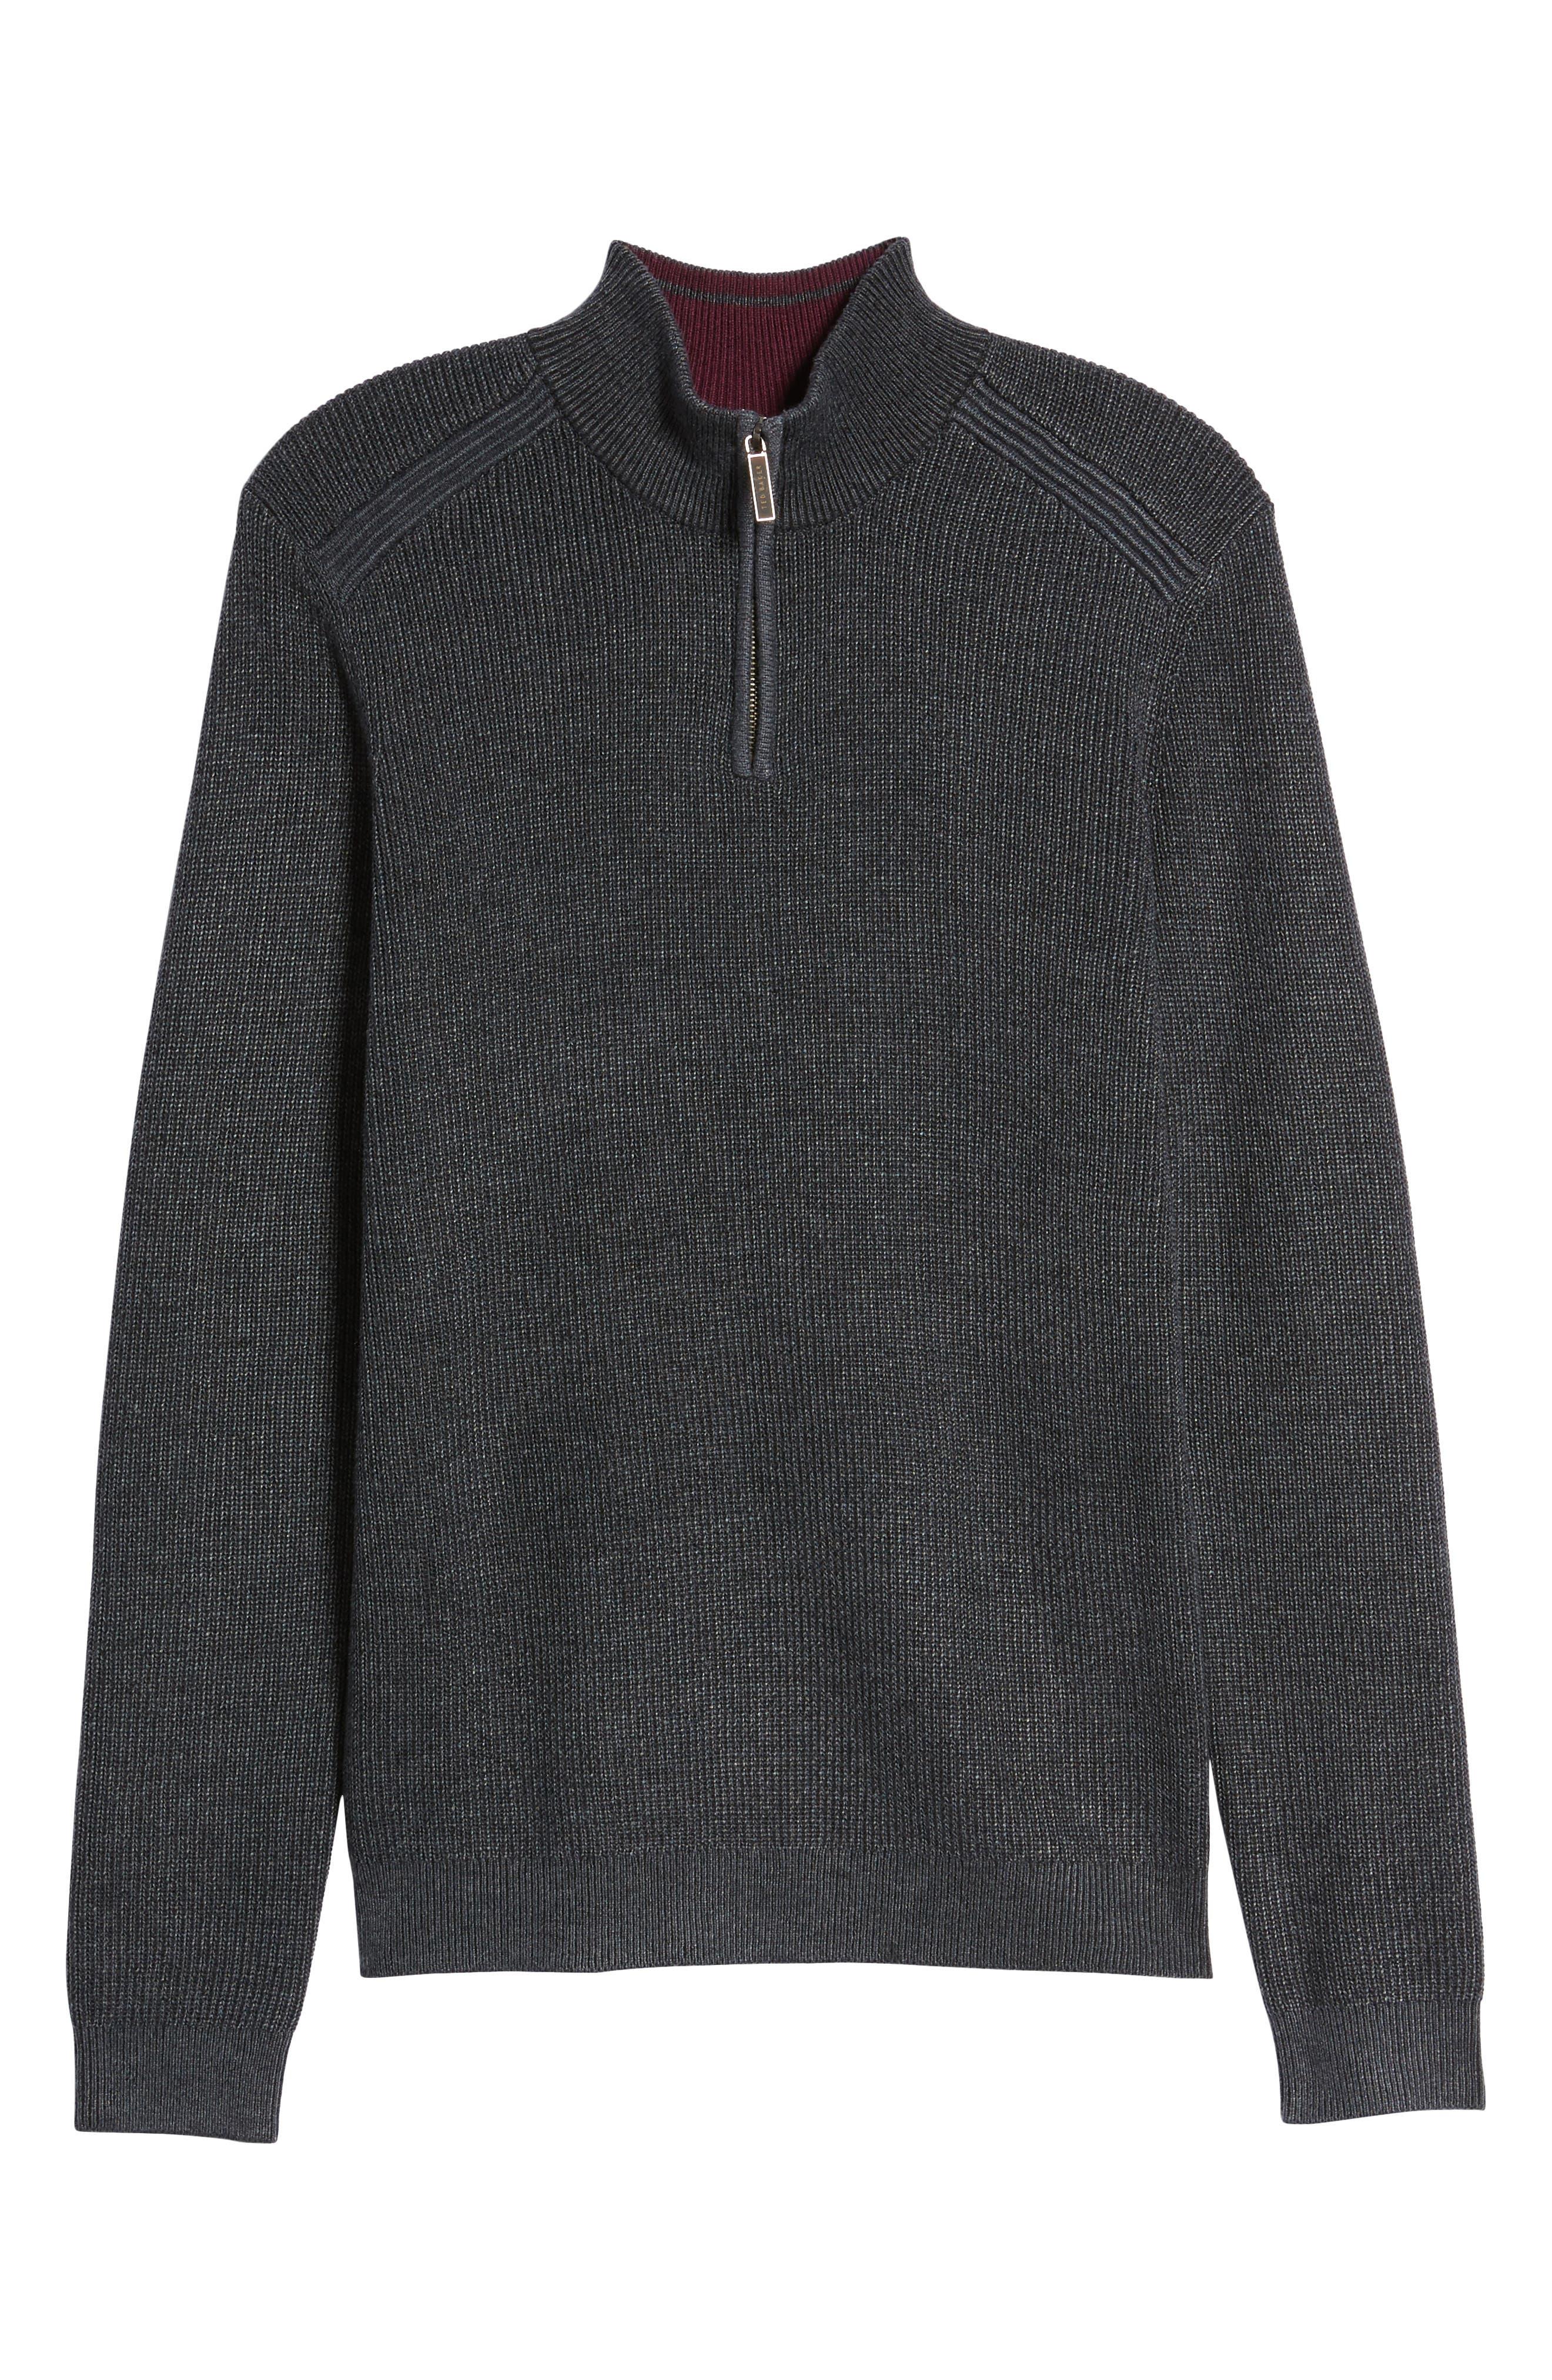 Stach Quarter Zip Sweater,                             Alternate thumbnail 6, color,                             010